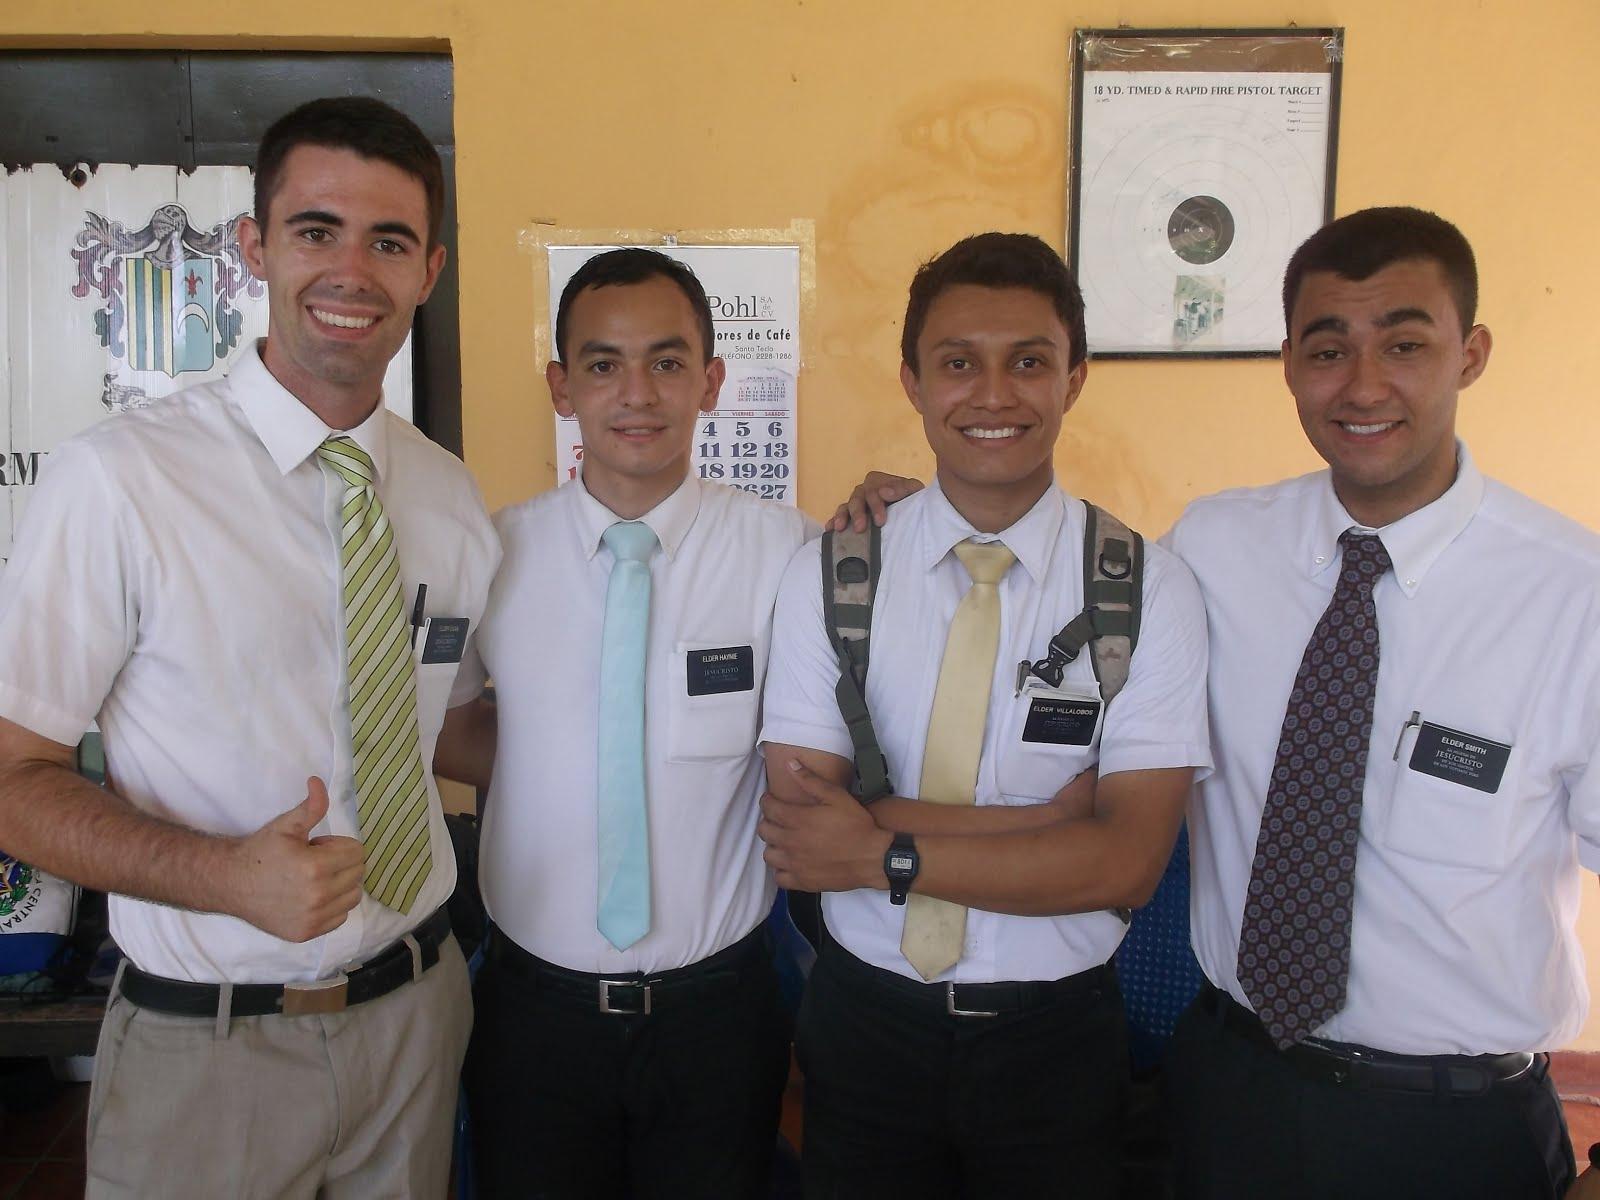 The 4 Limenos